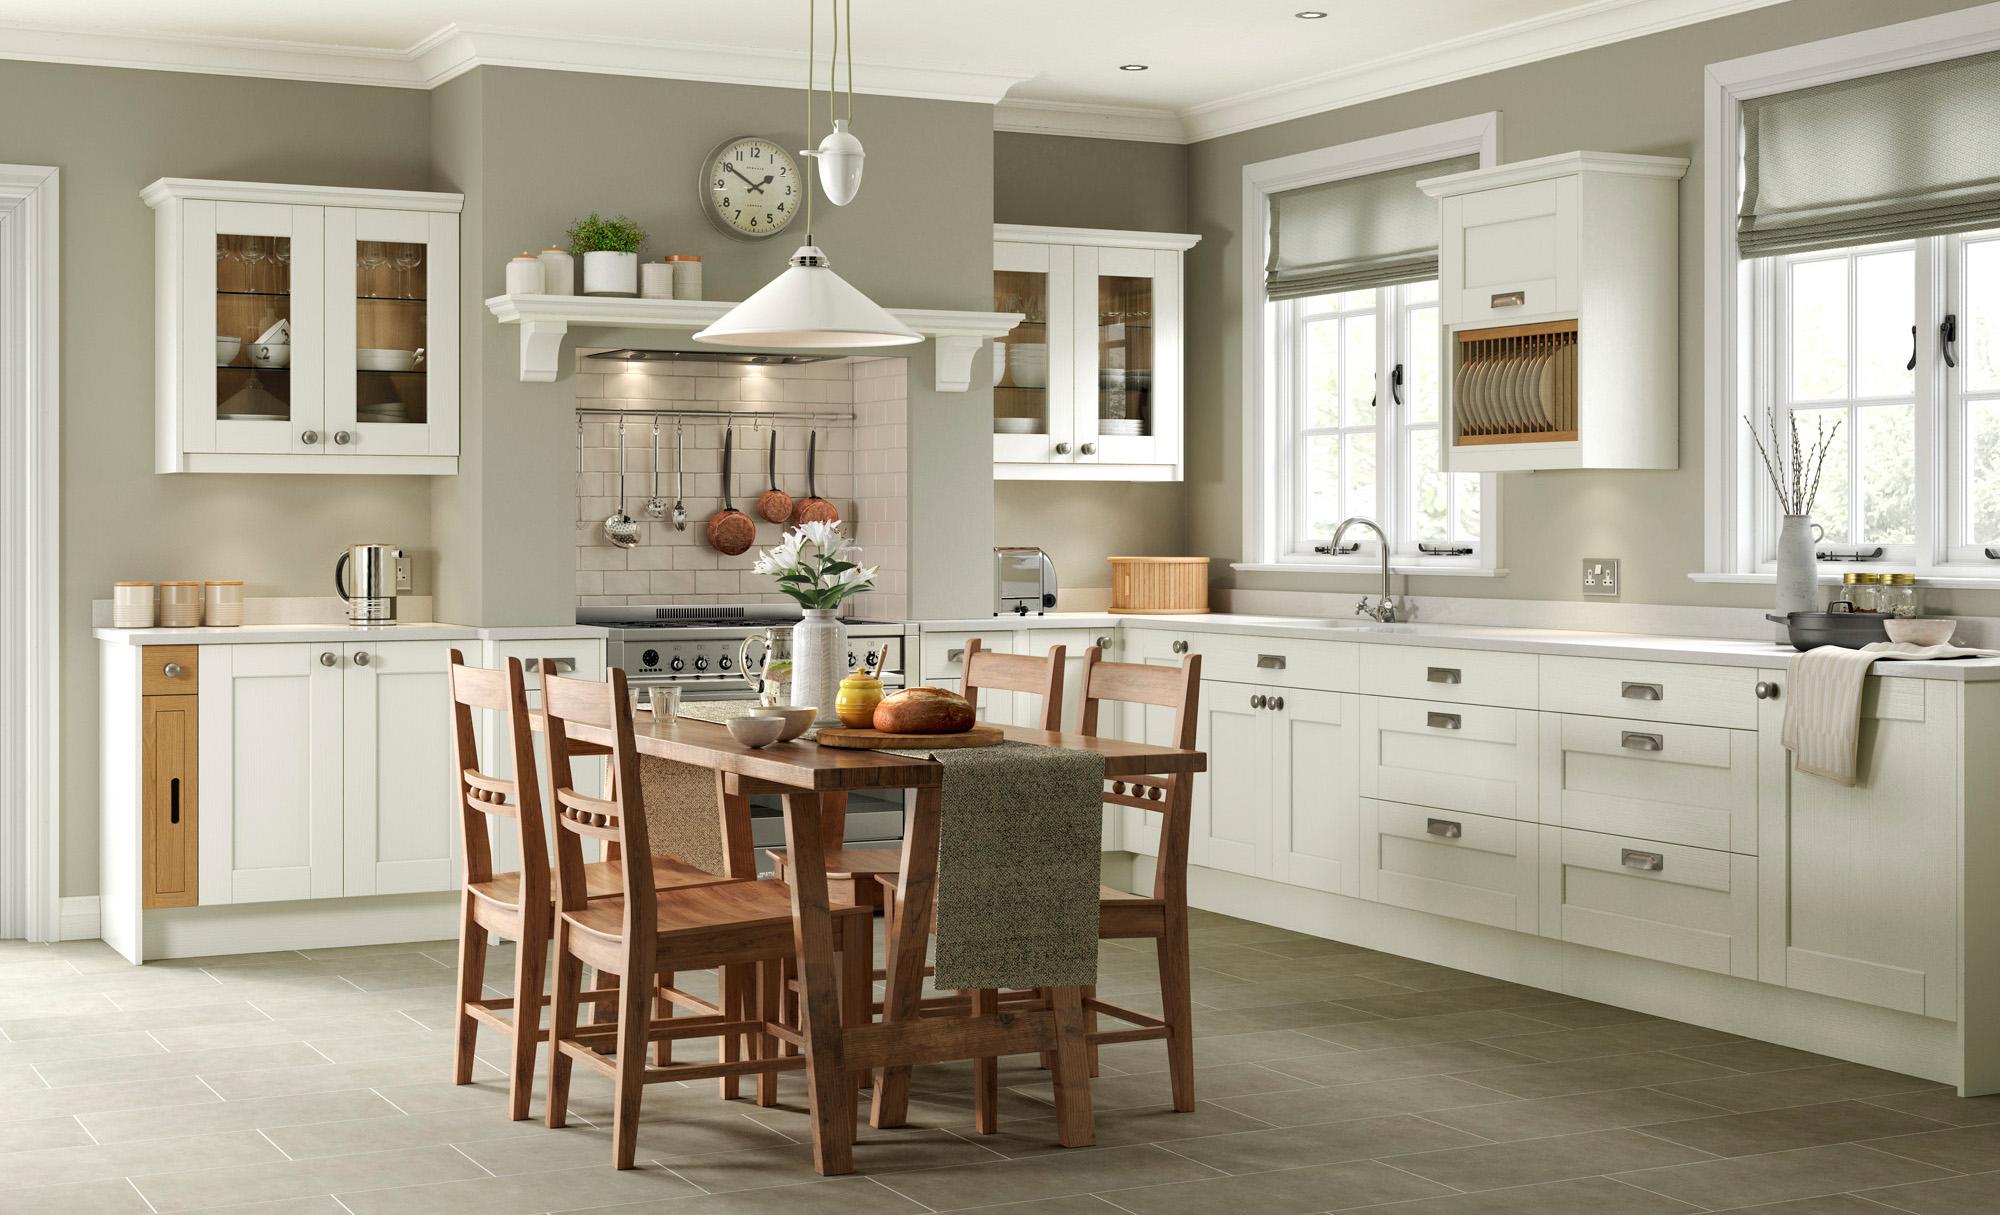 Classic Traditional Kitchen - Kensington Ivory Kitchen - Kitchen Design - Alan Kelly Kitchens - Waterford